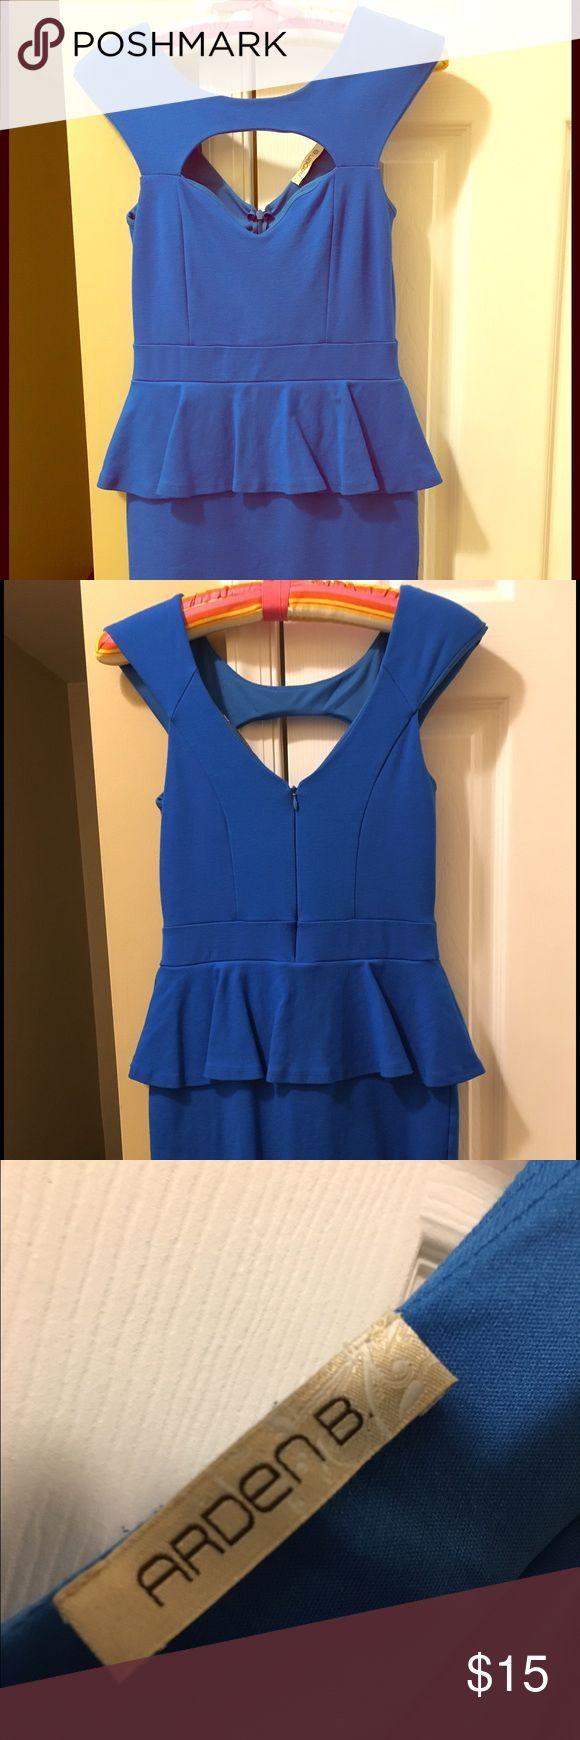 Arden B electric blue dress. Gently worn Arden B electric blue dress size 8 gently worn Arden B Dresses Midi